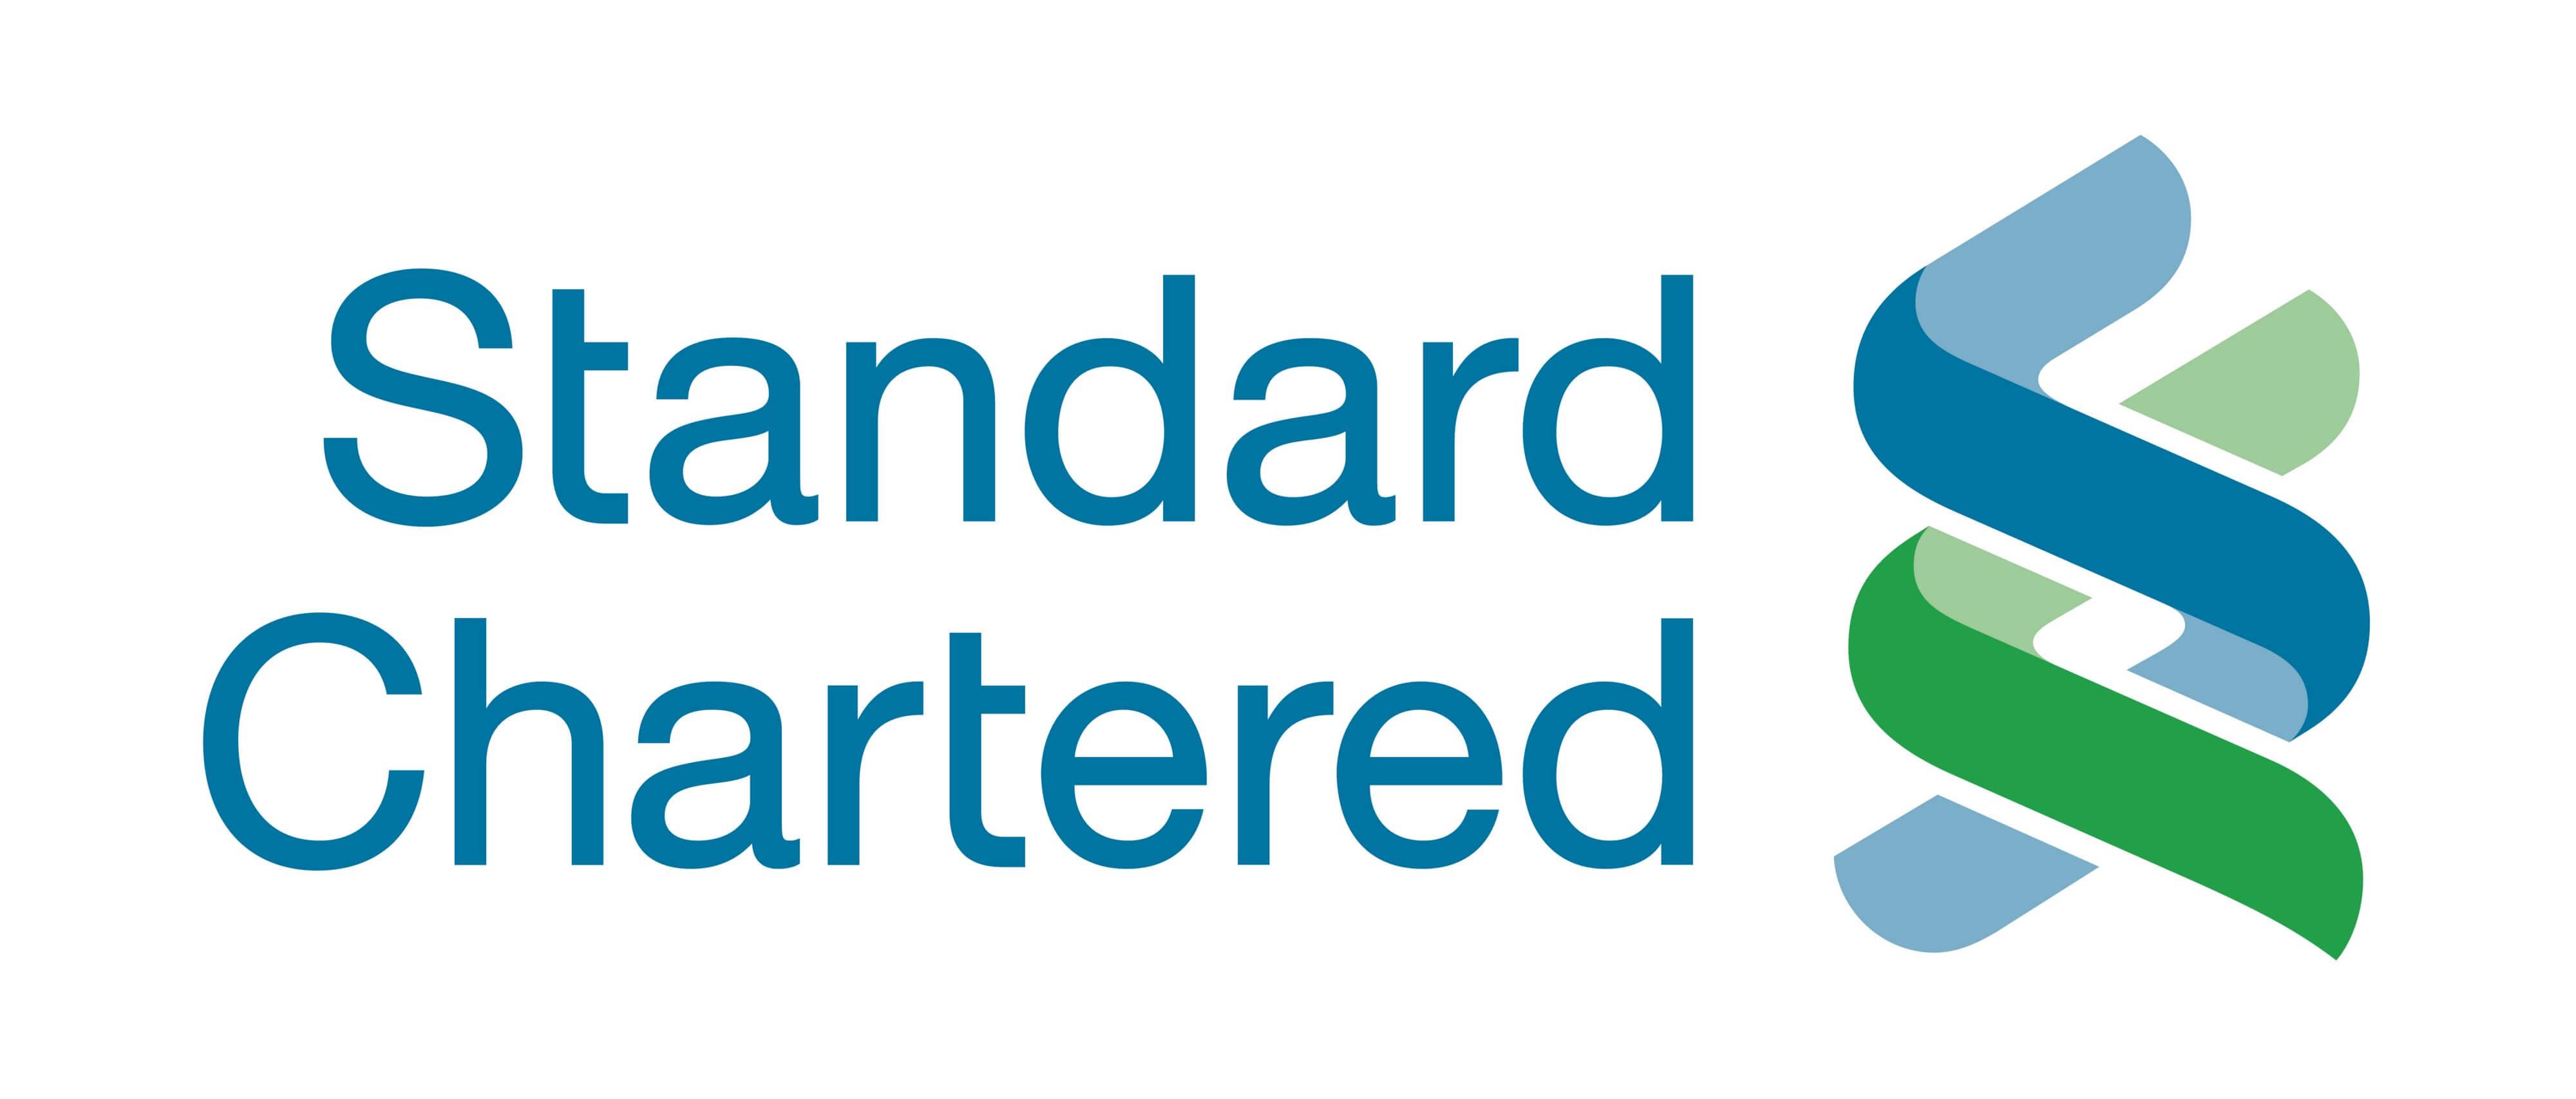 Standard Chartered - Daftar KTA Kilat Terbaik dan Terpercaya di Tahun 2020